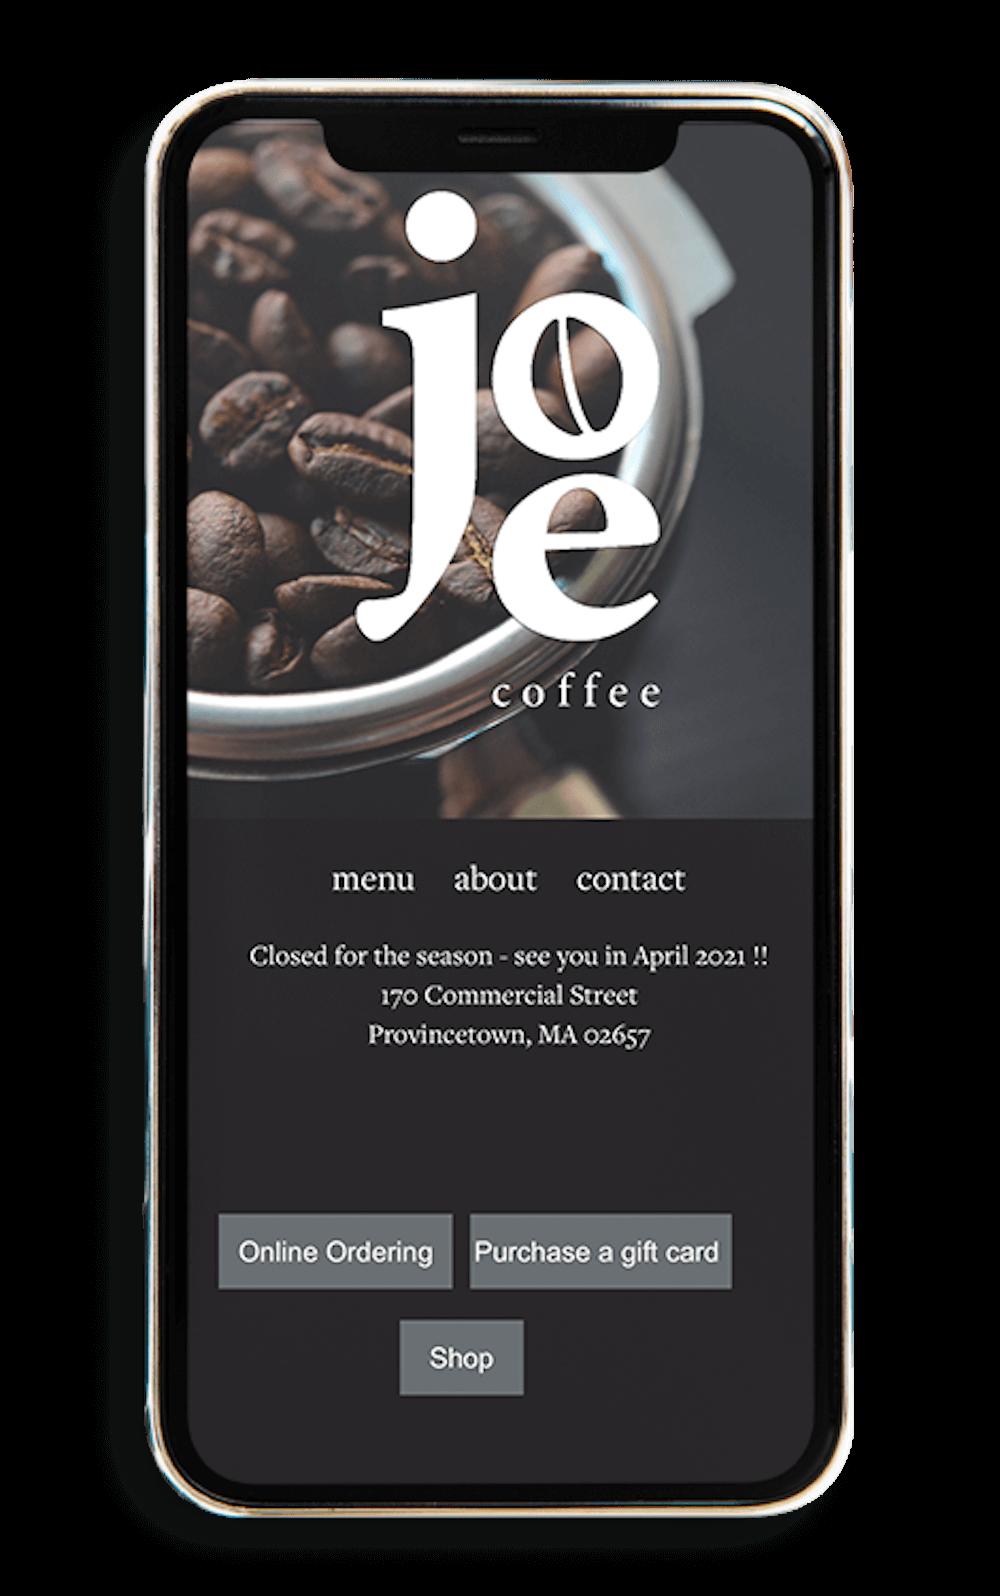 Joe Coffee Mobile